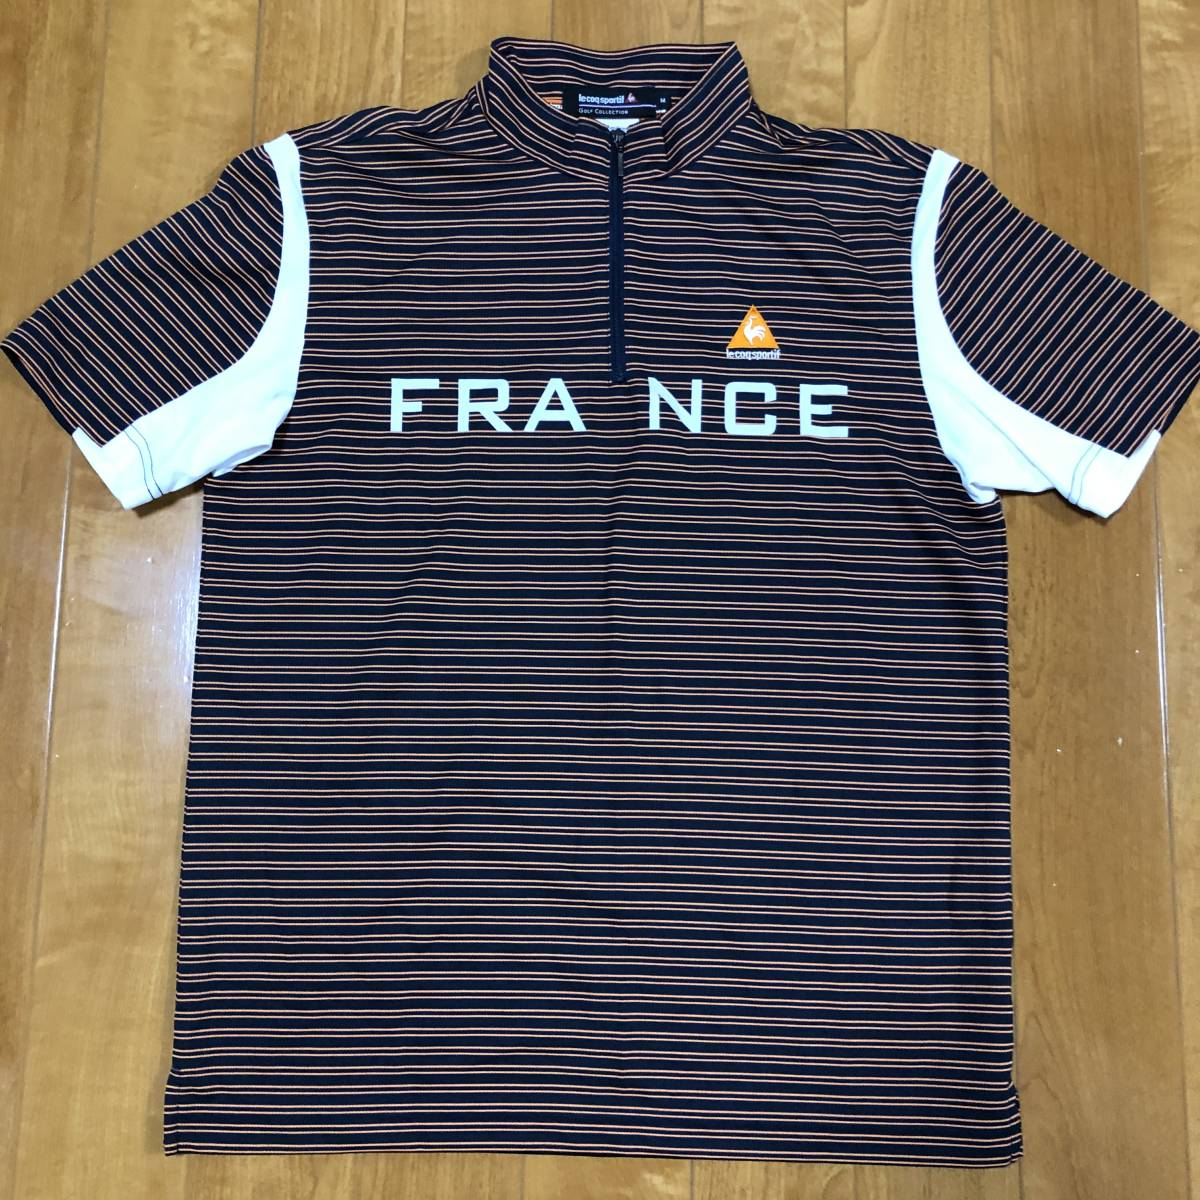 【le coq sportif golf】 ルコック ゴルフ ゴルフウェア 半袖 ハーフジップ ポロシャツ メンズ Mサイズ 美品!_画像1